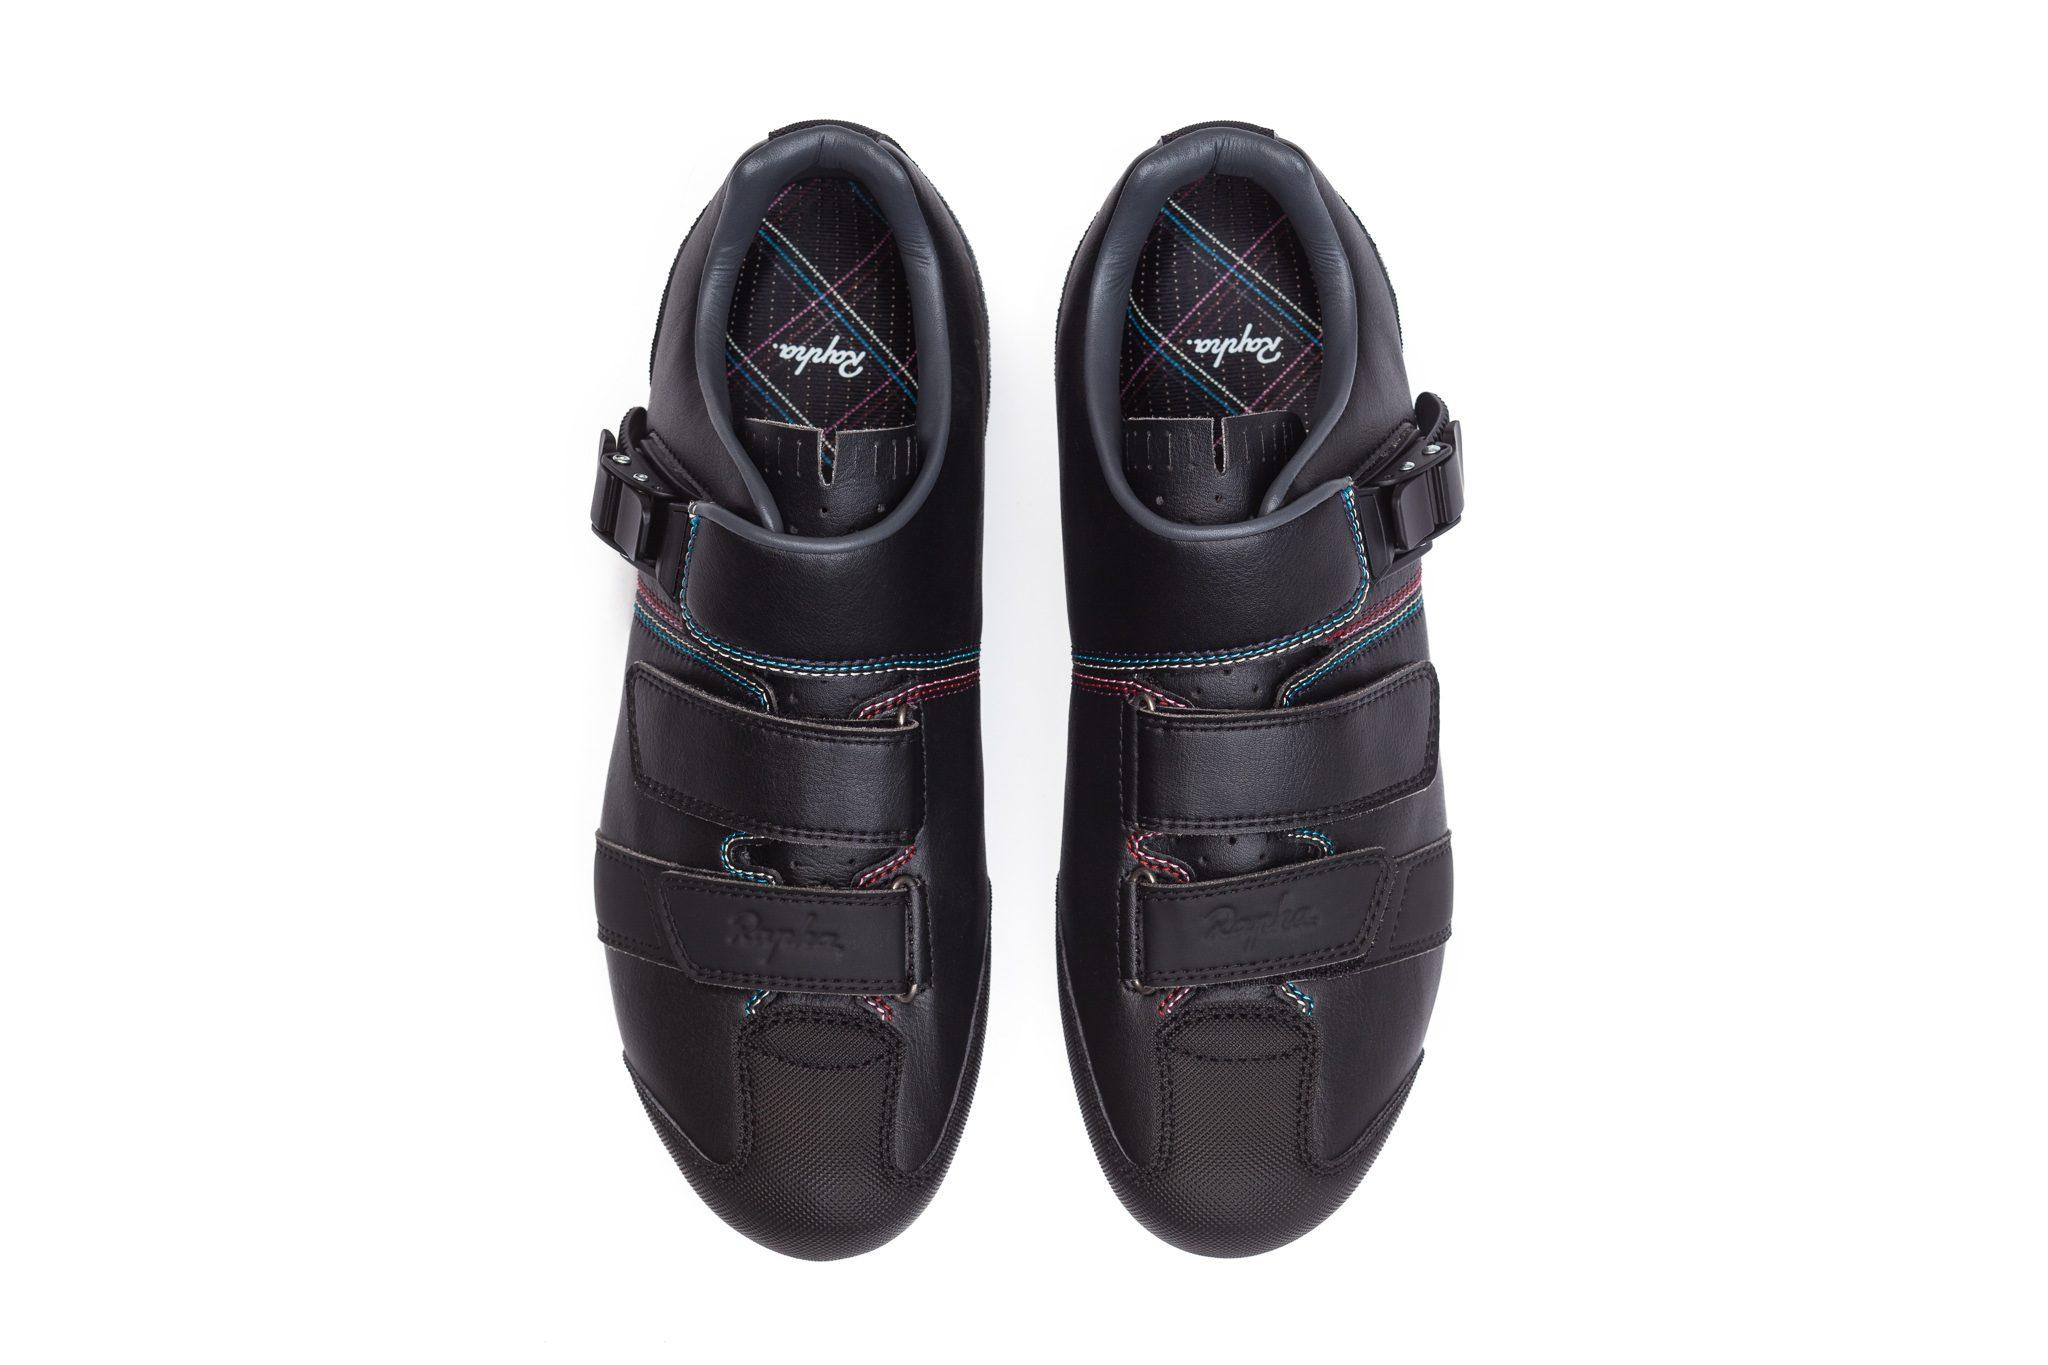 AW14-Rapha-Cross-Shoe-Main-6